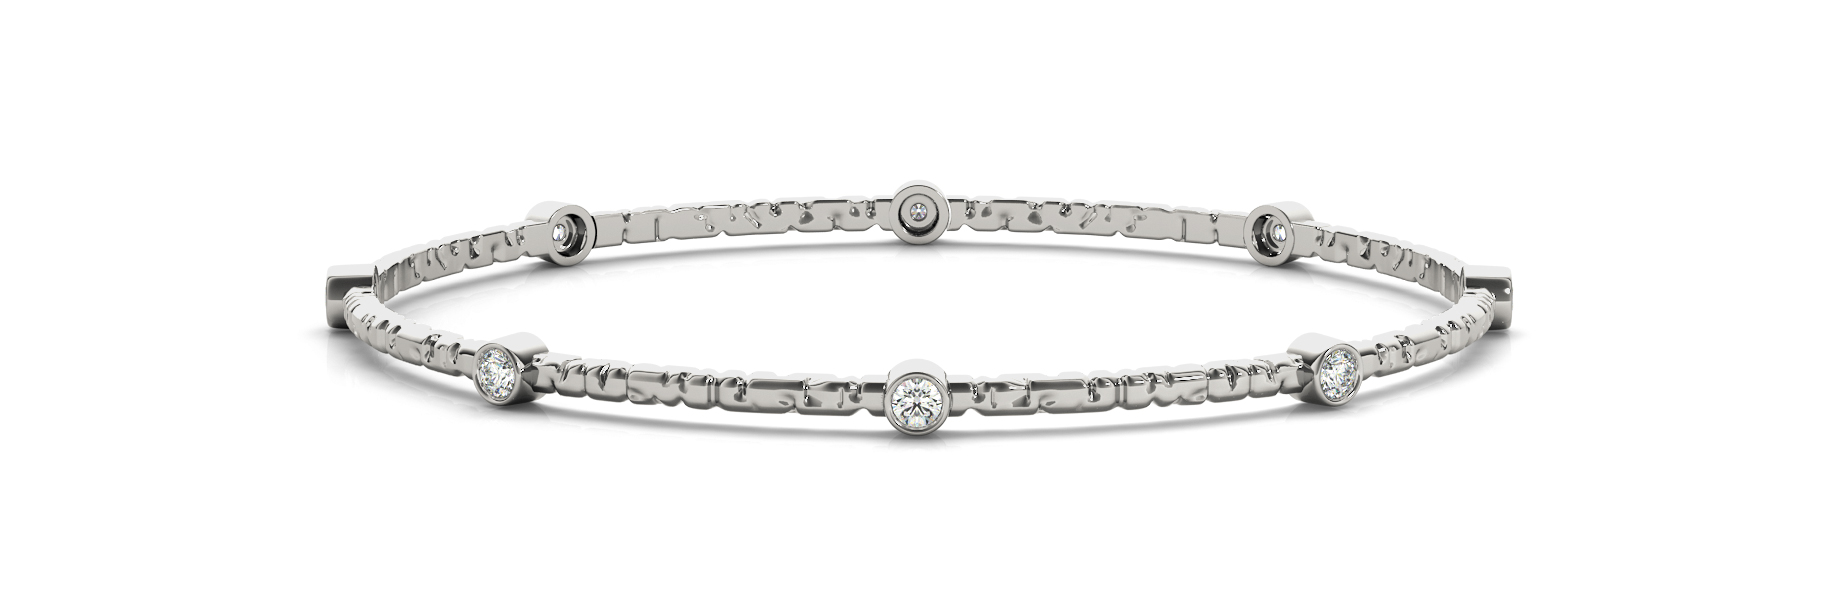 1/4 ct tw 14kt gold White Bracelet 8 - .03PT Round